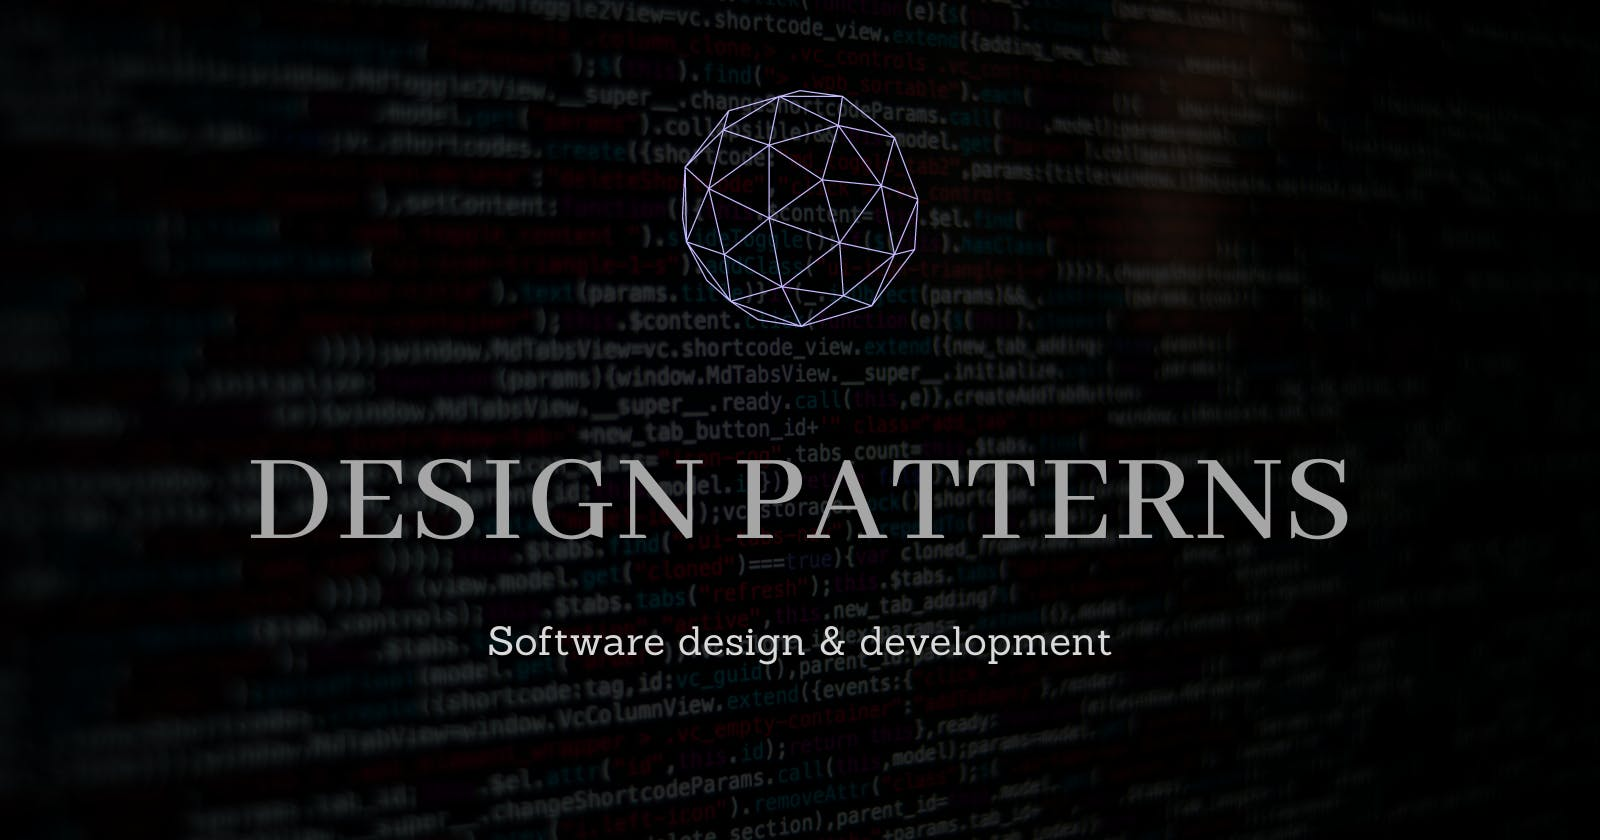 Design Patterns for software design and development